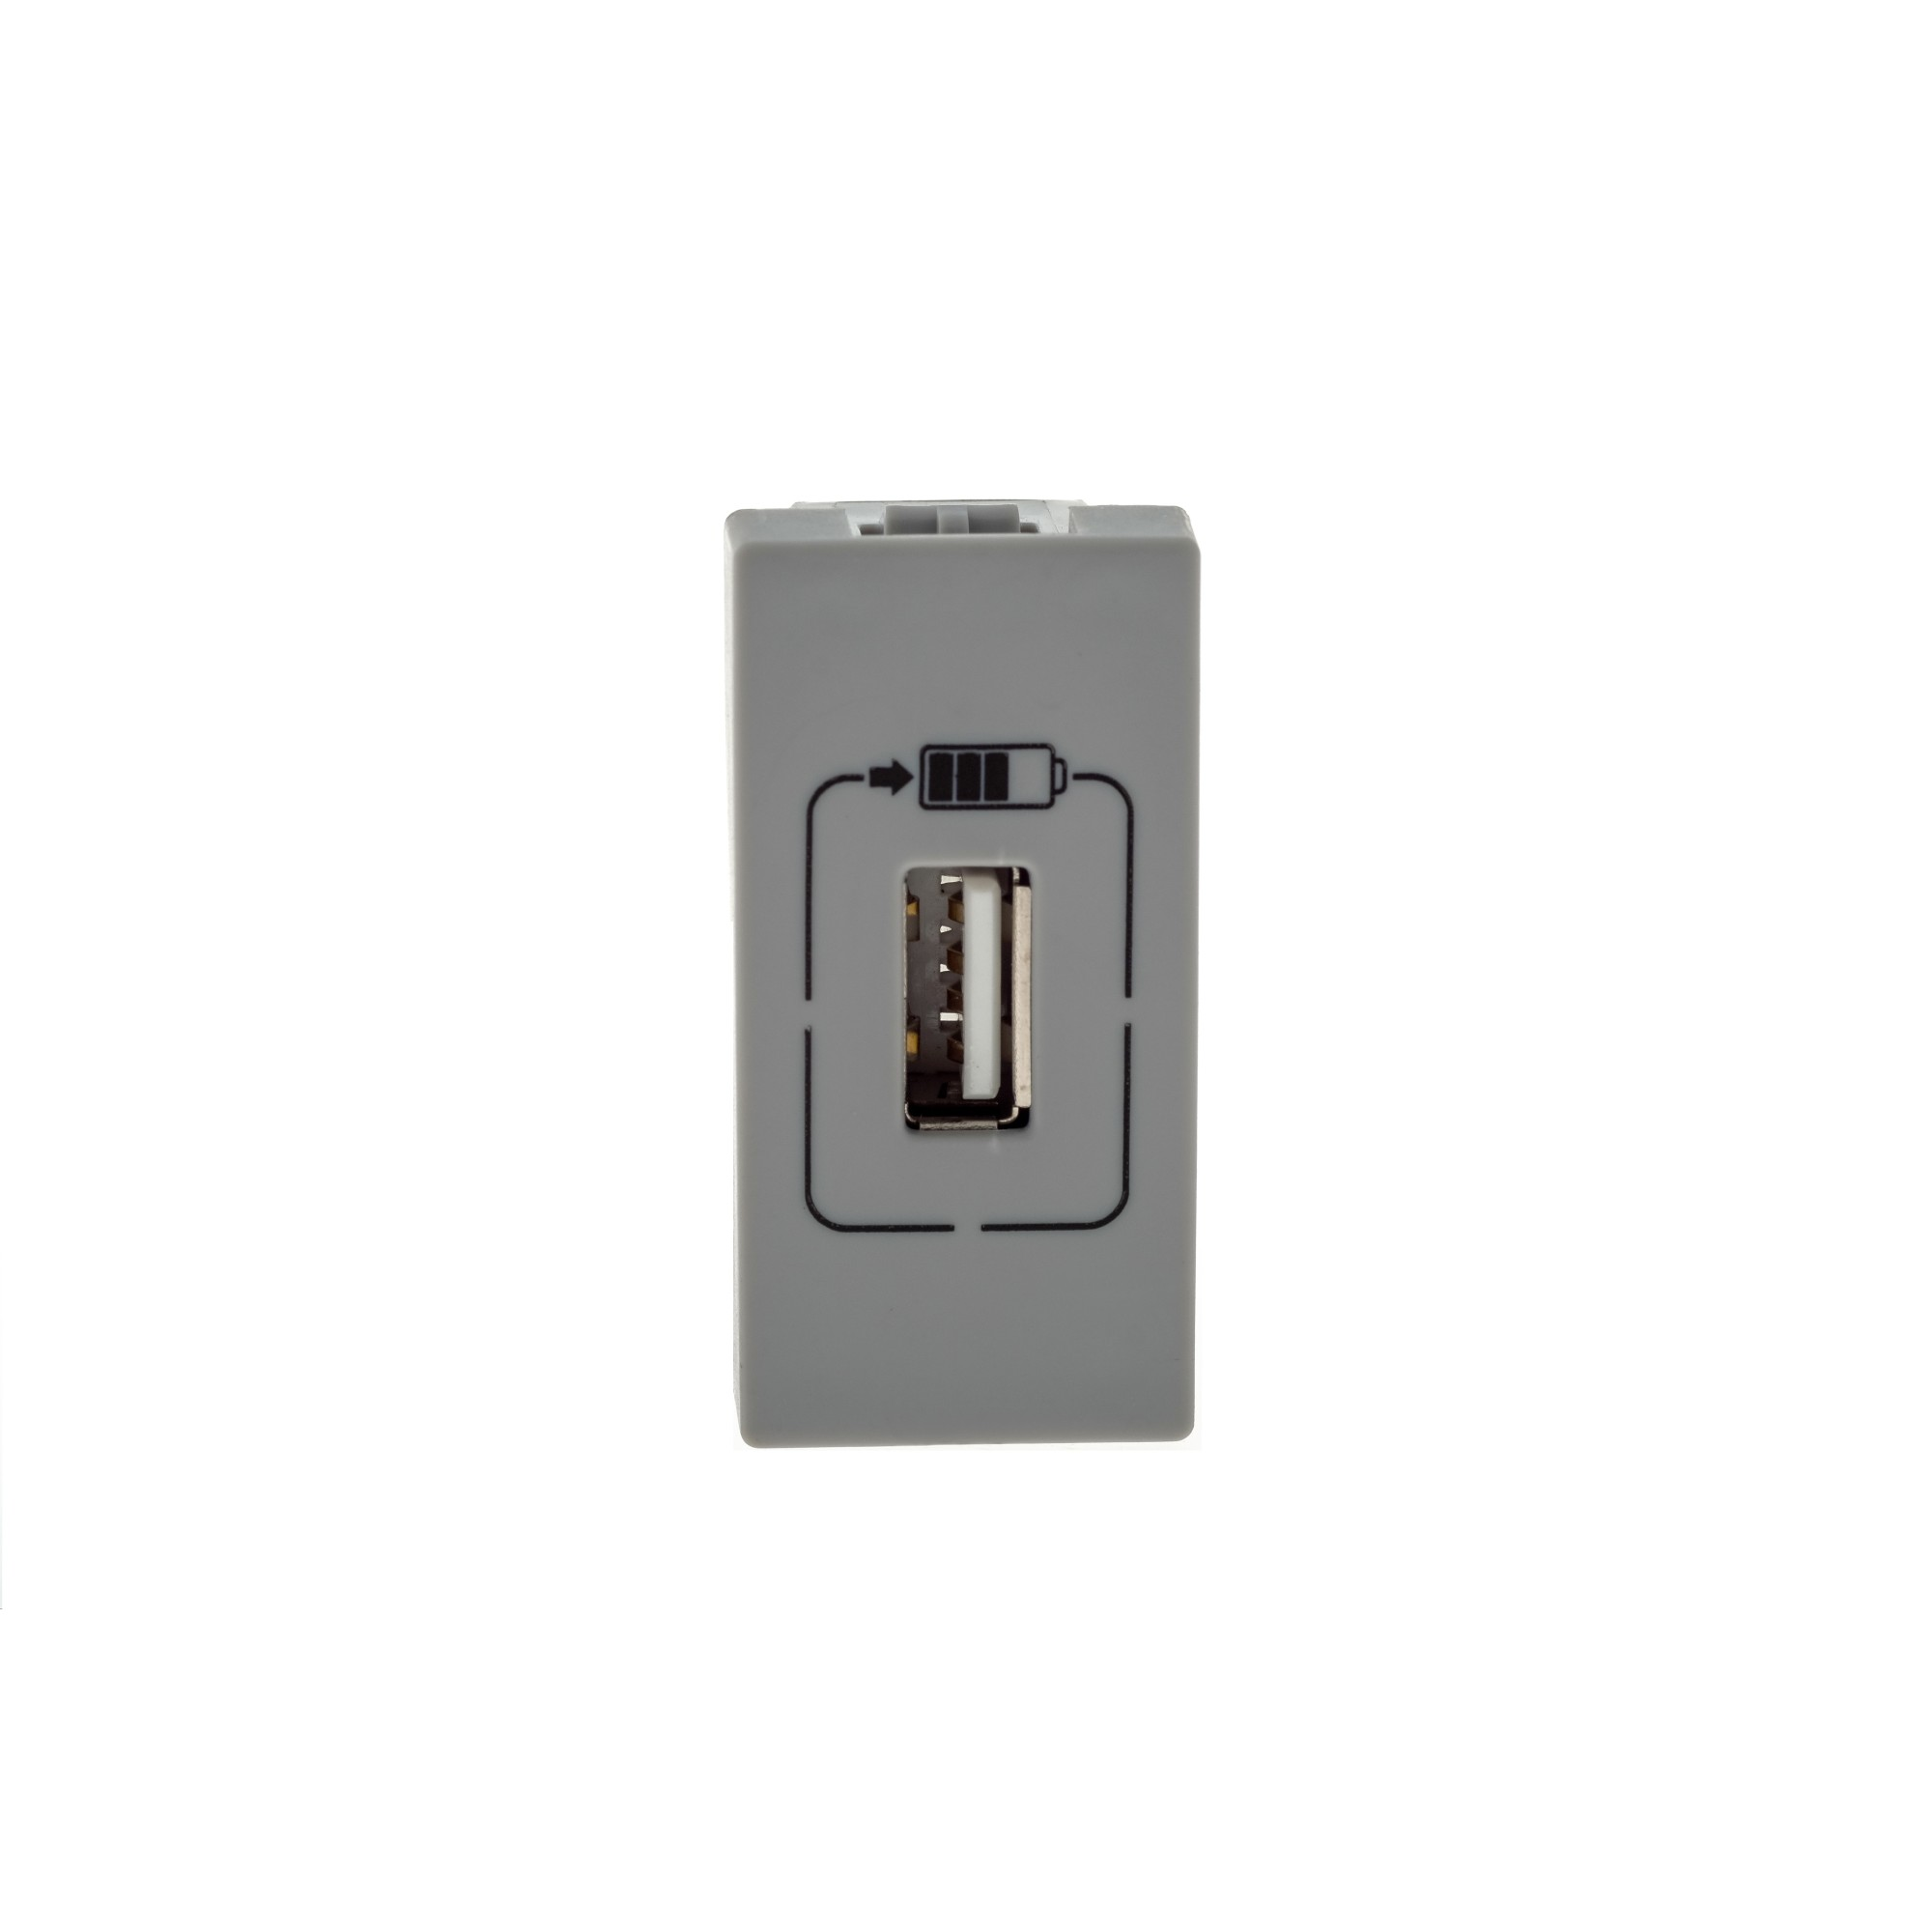 Modulo de Tomada para Carregador USB Cinza 615088 Bivolt - Legrand